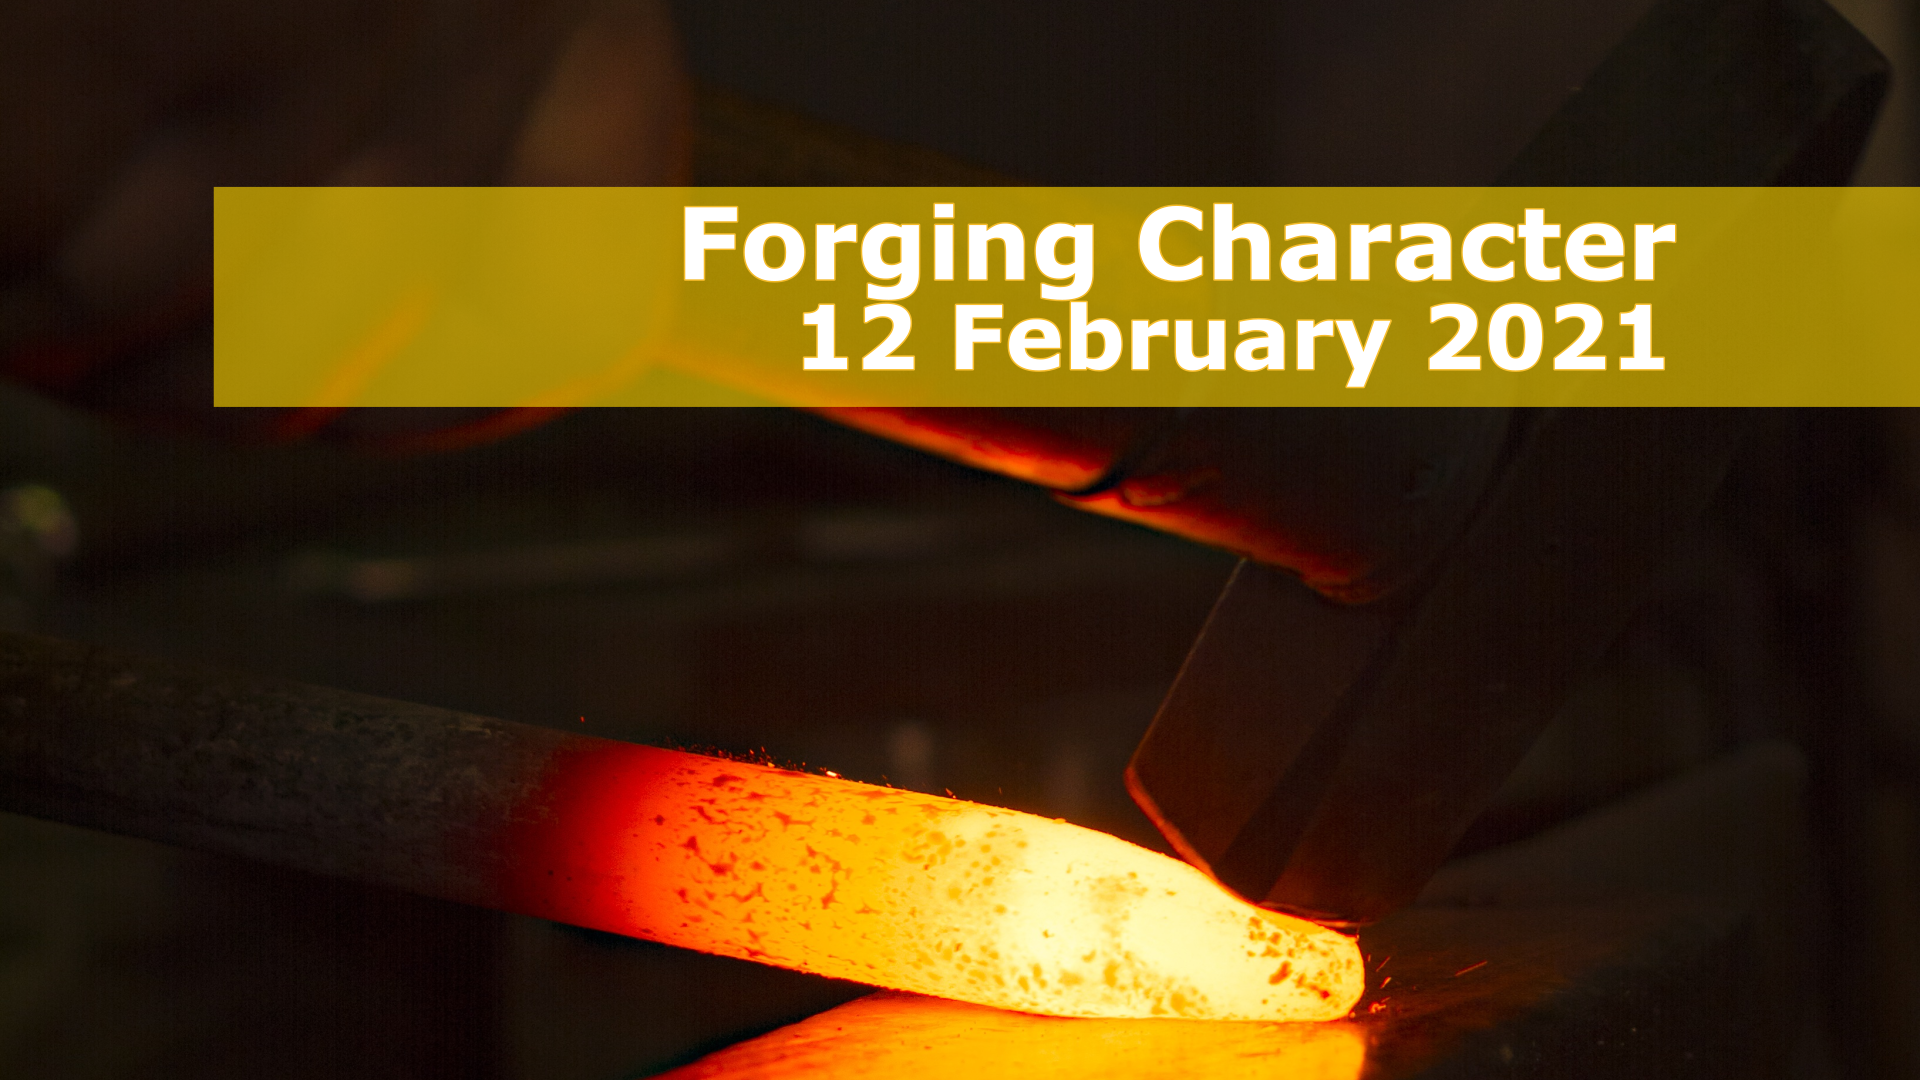 <span class='p-name'>Forging Character — 12 February 2021 Devotional</span>